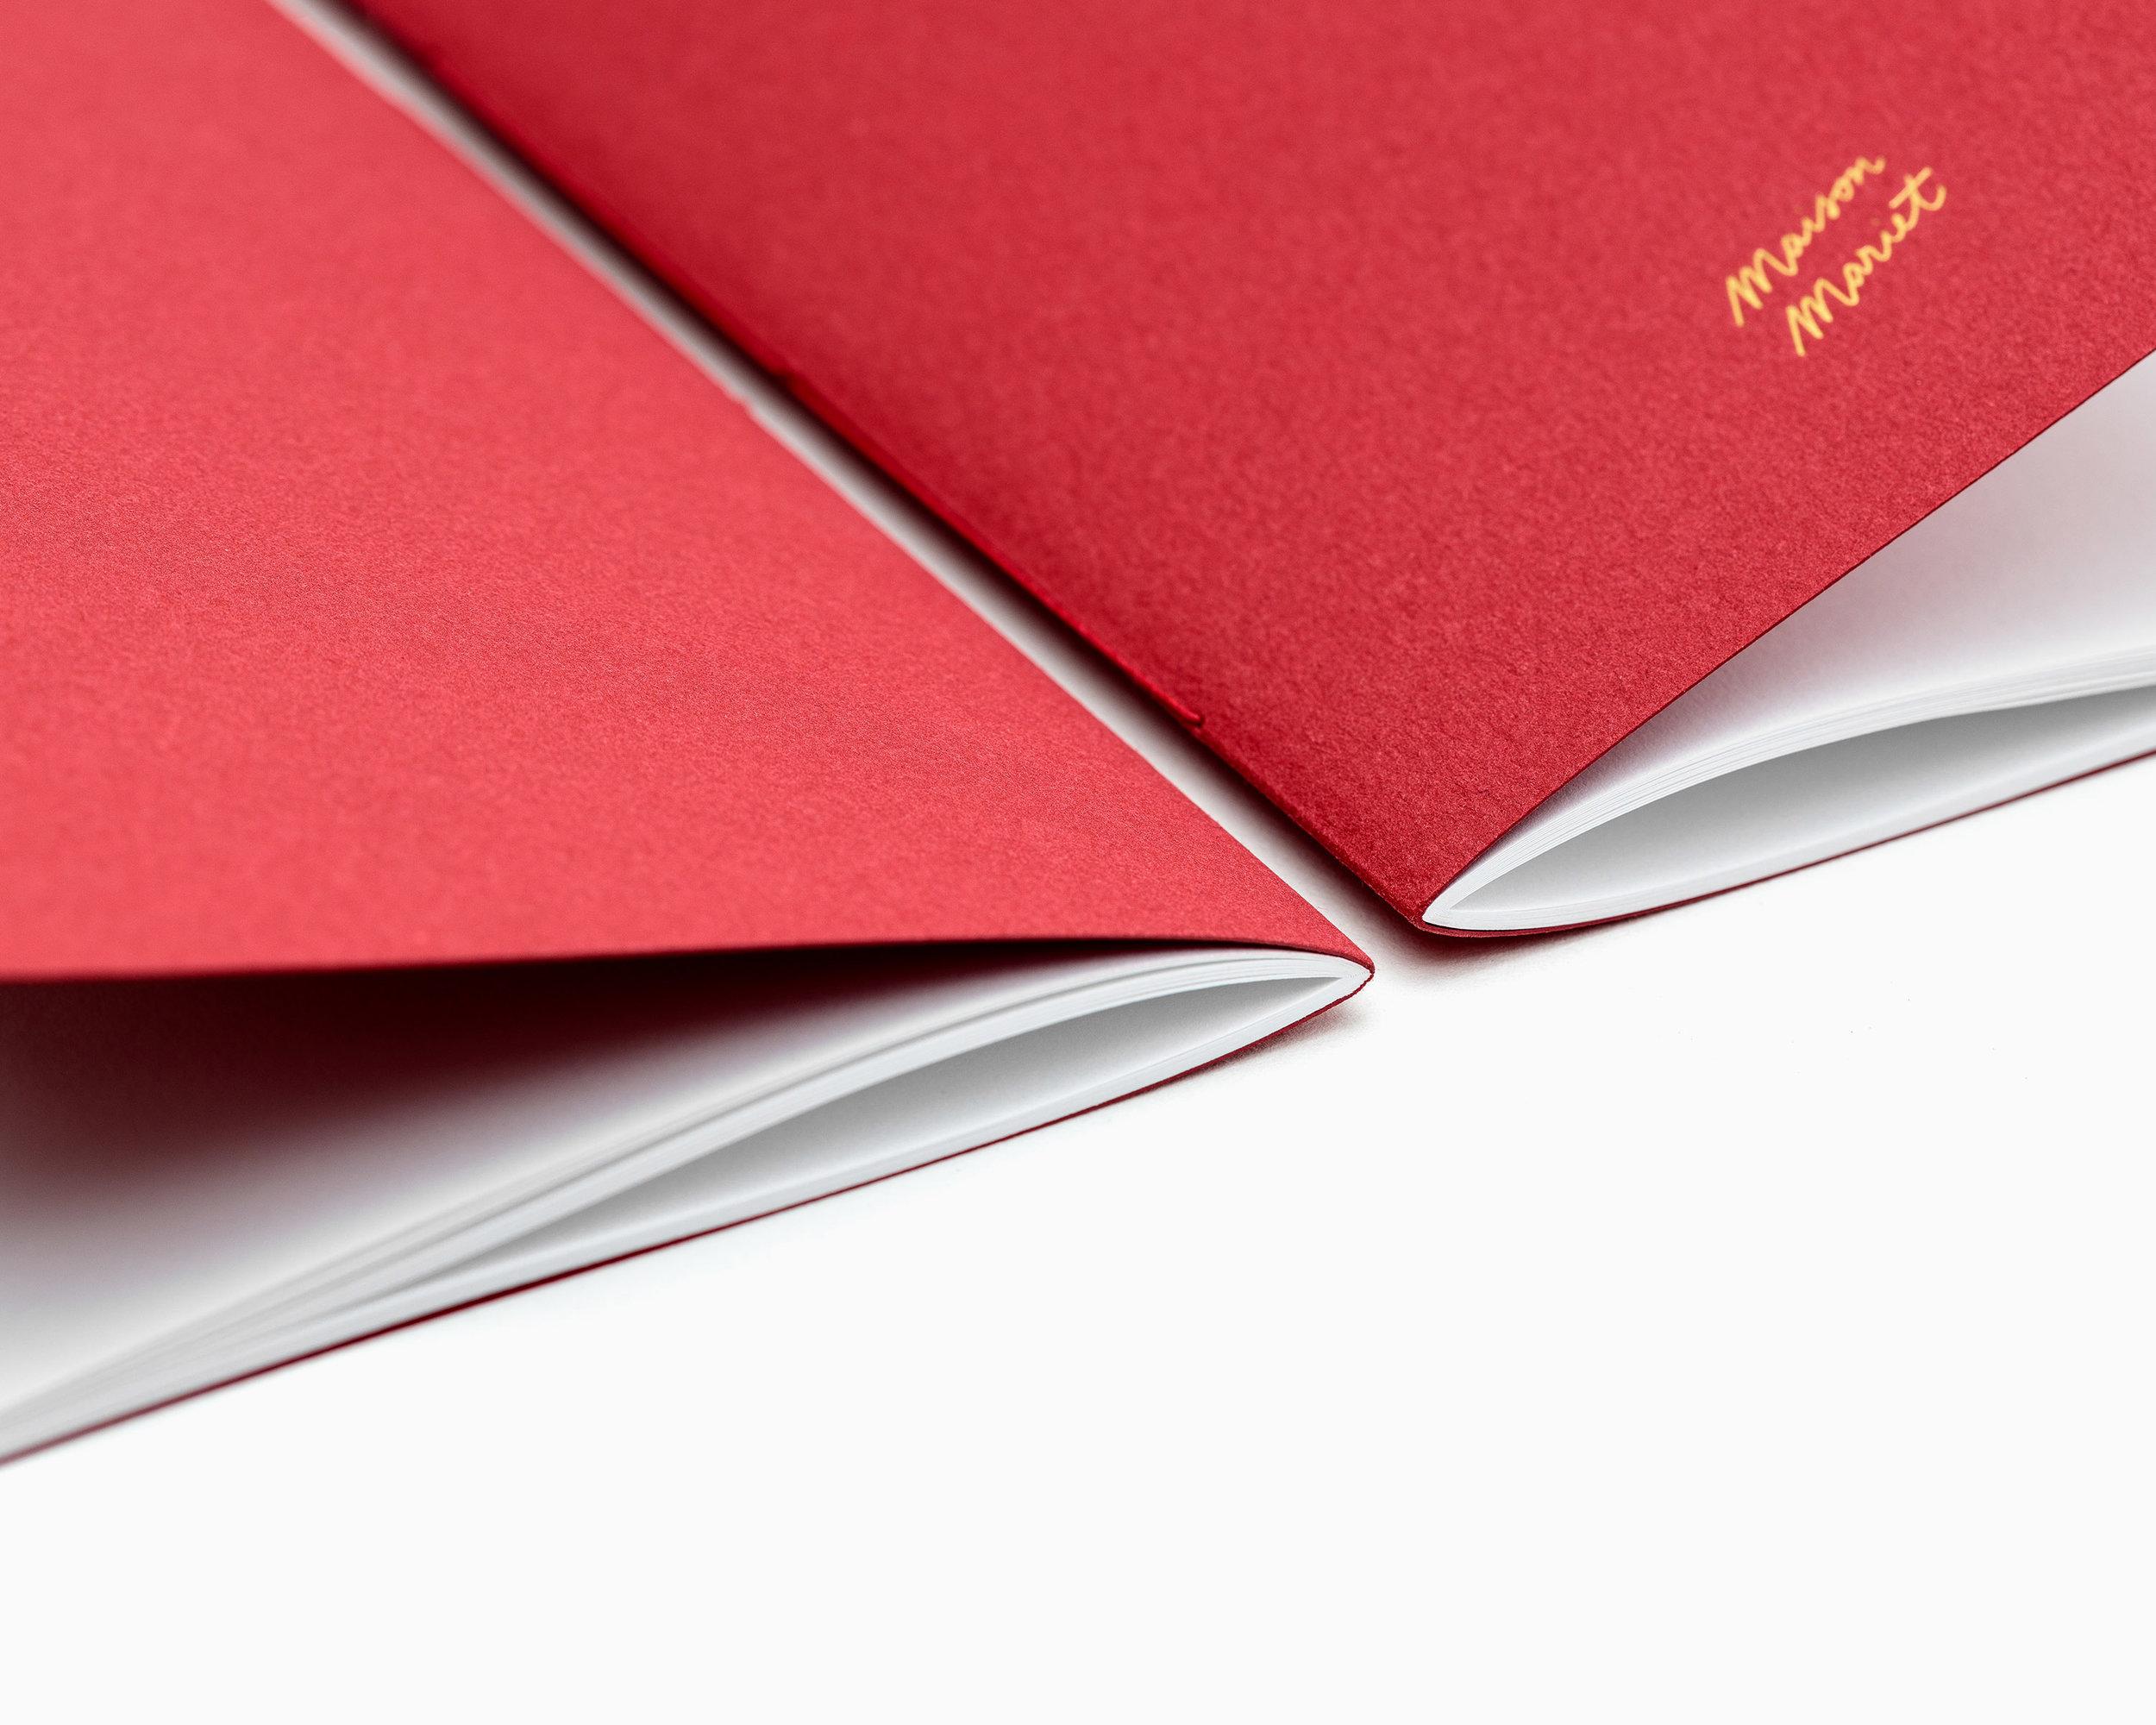 carnet 12x18cm rouge.jpg